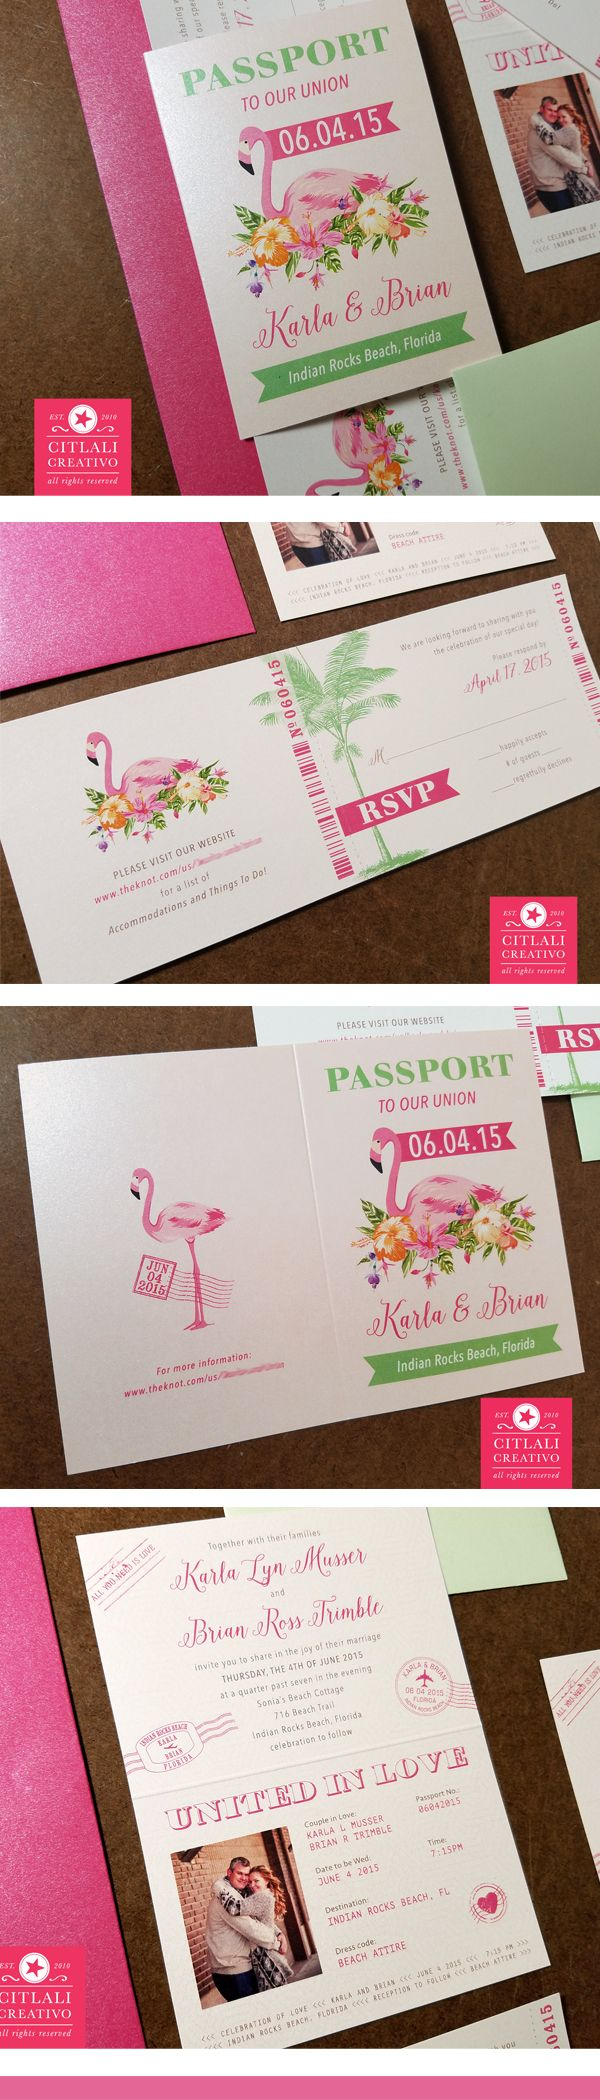 blank beach bridal shower invitations%0A Flamingo Passport   Boarding Pass Beach Wedding Invitations in hot pink